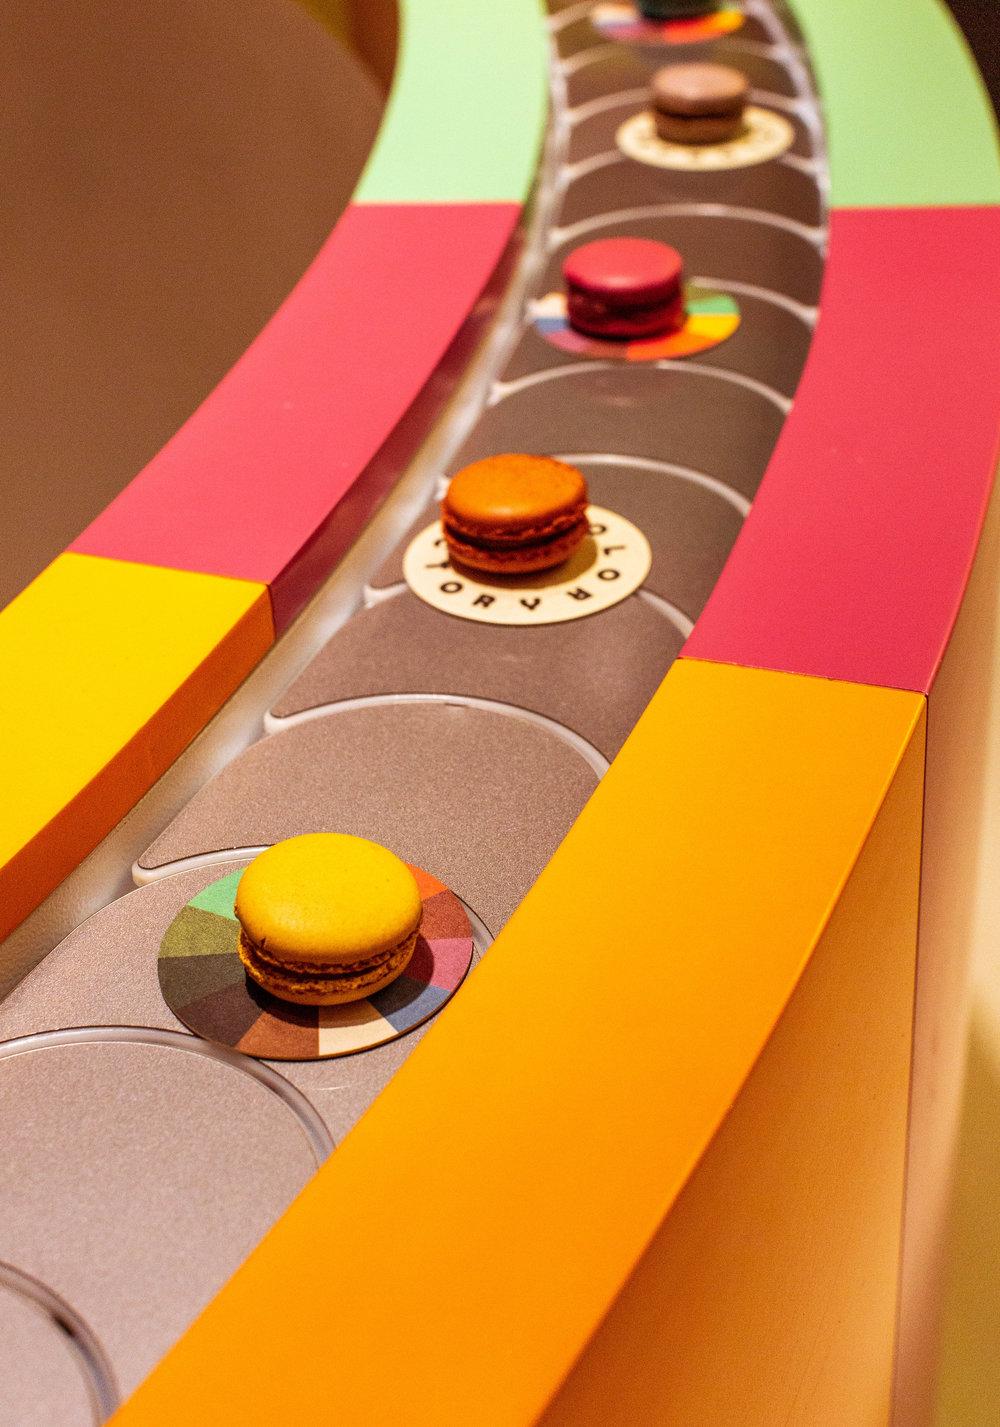 macarons 2 (1 of 1).jpg